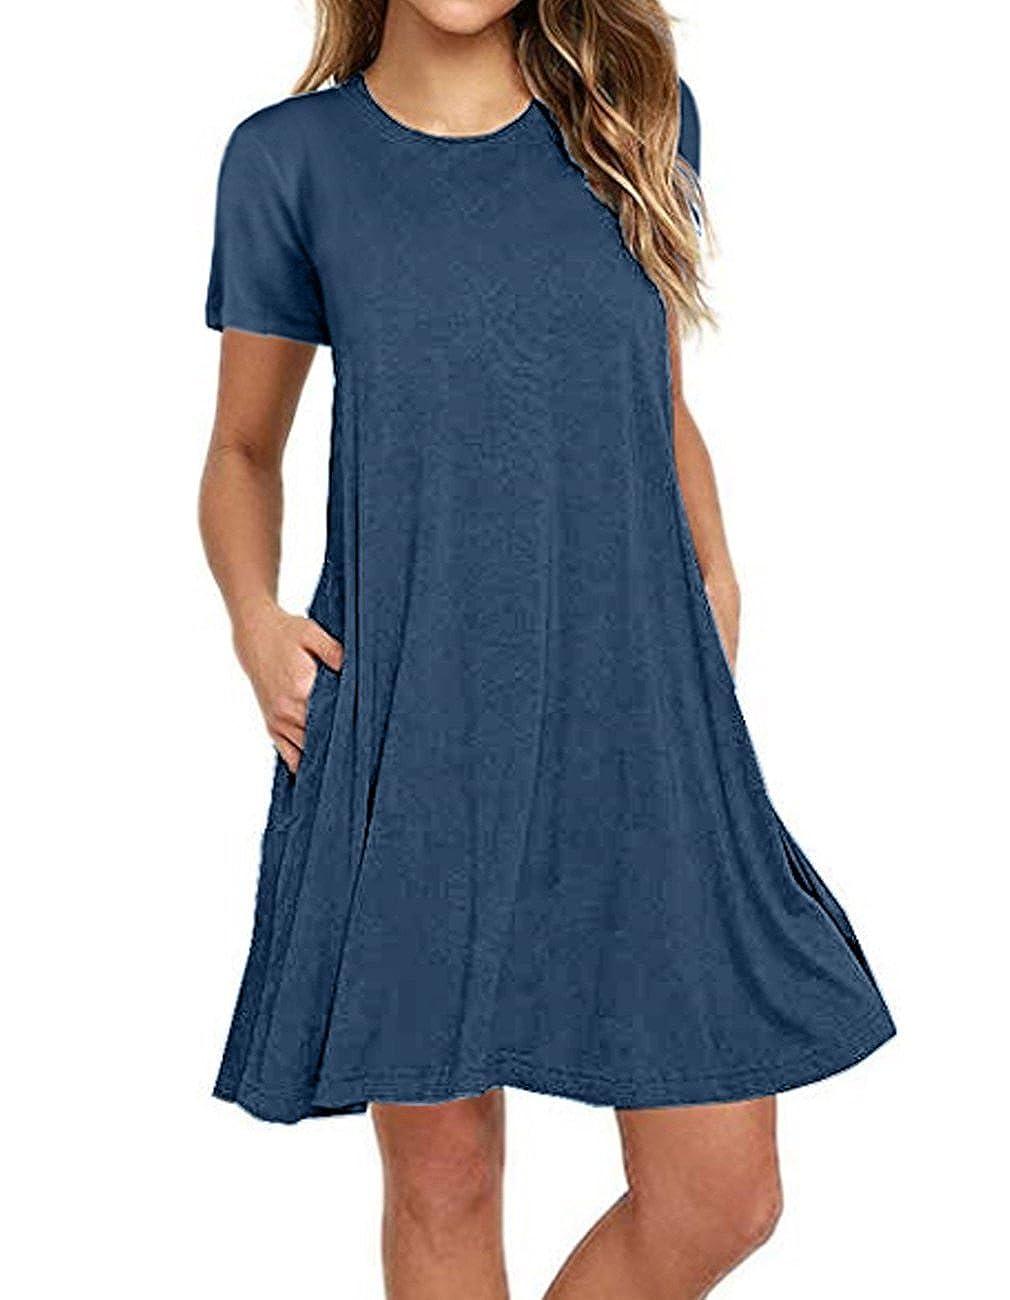 Shfz Womens Long Sleeve Casual T Shirt Dress With Pocket Loose Flowy